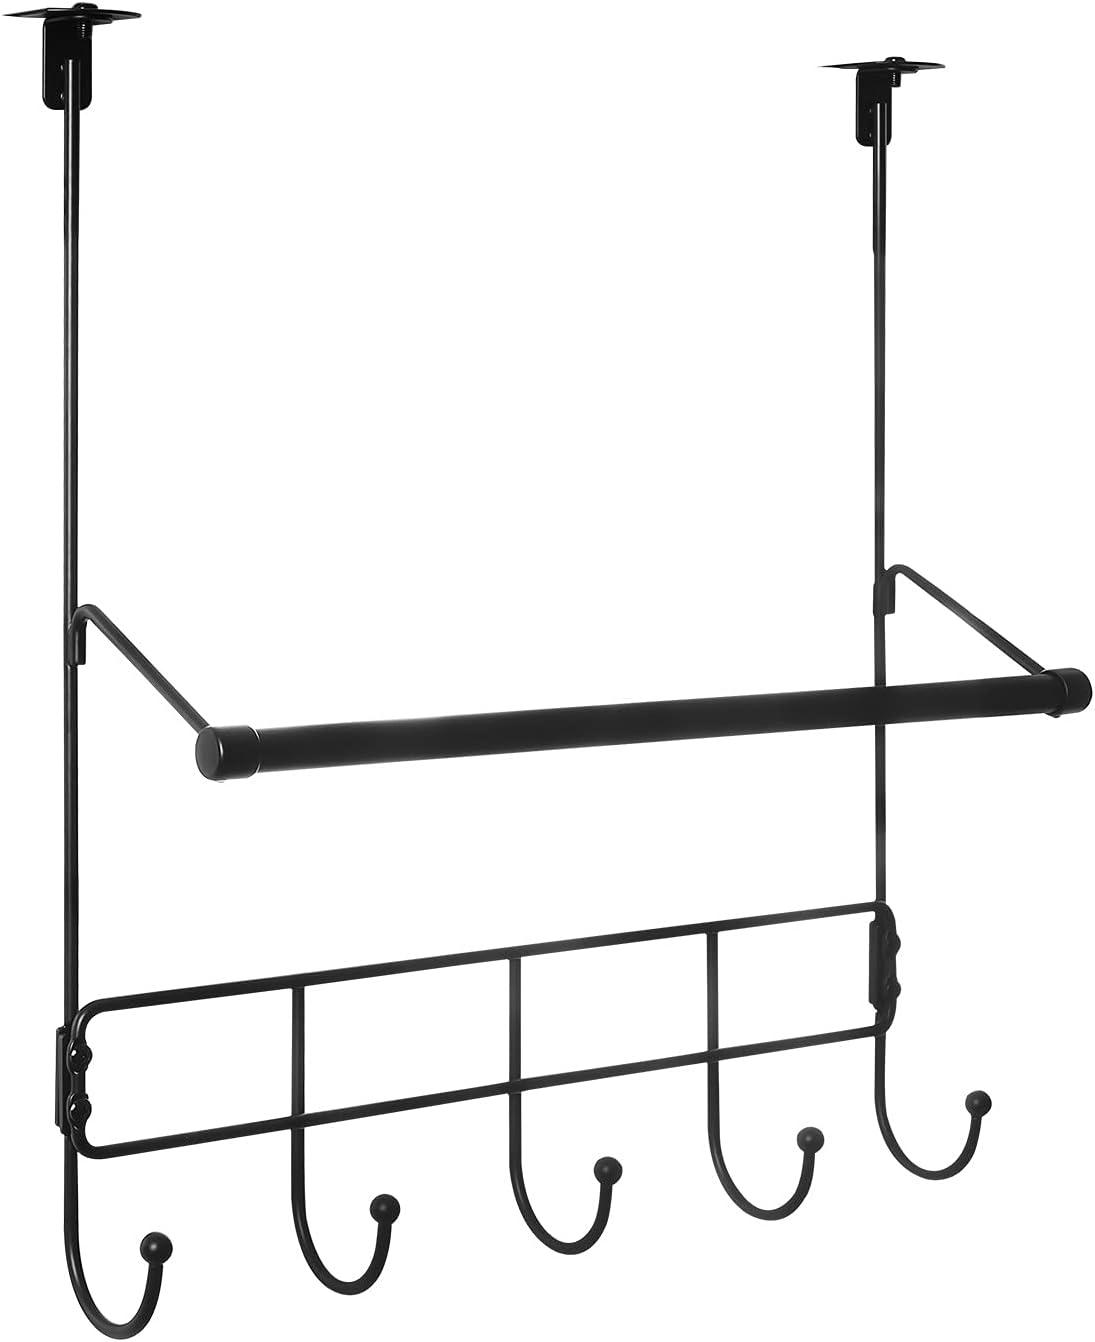 Ezprotekt Over The Door specialty shop Beauty products Hook Hanger Hooks 5 O Steel Stainless -